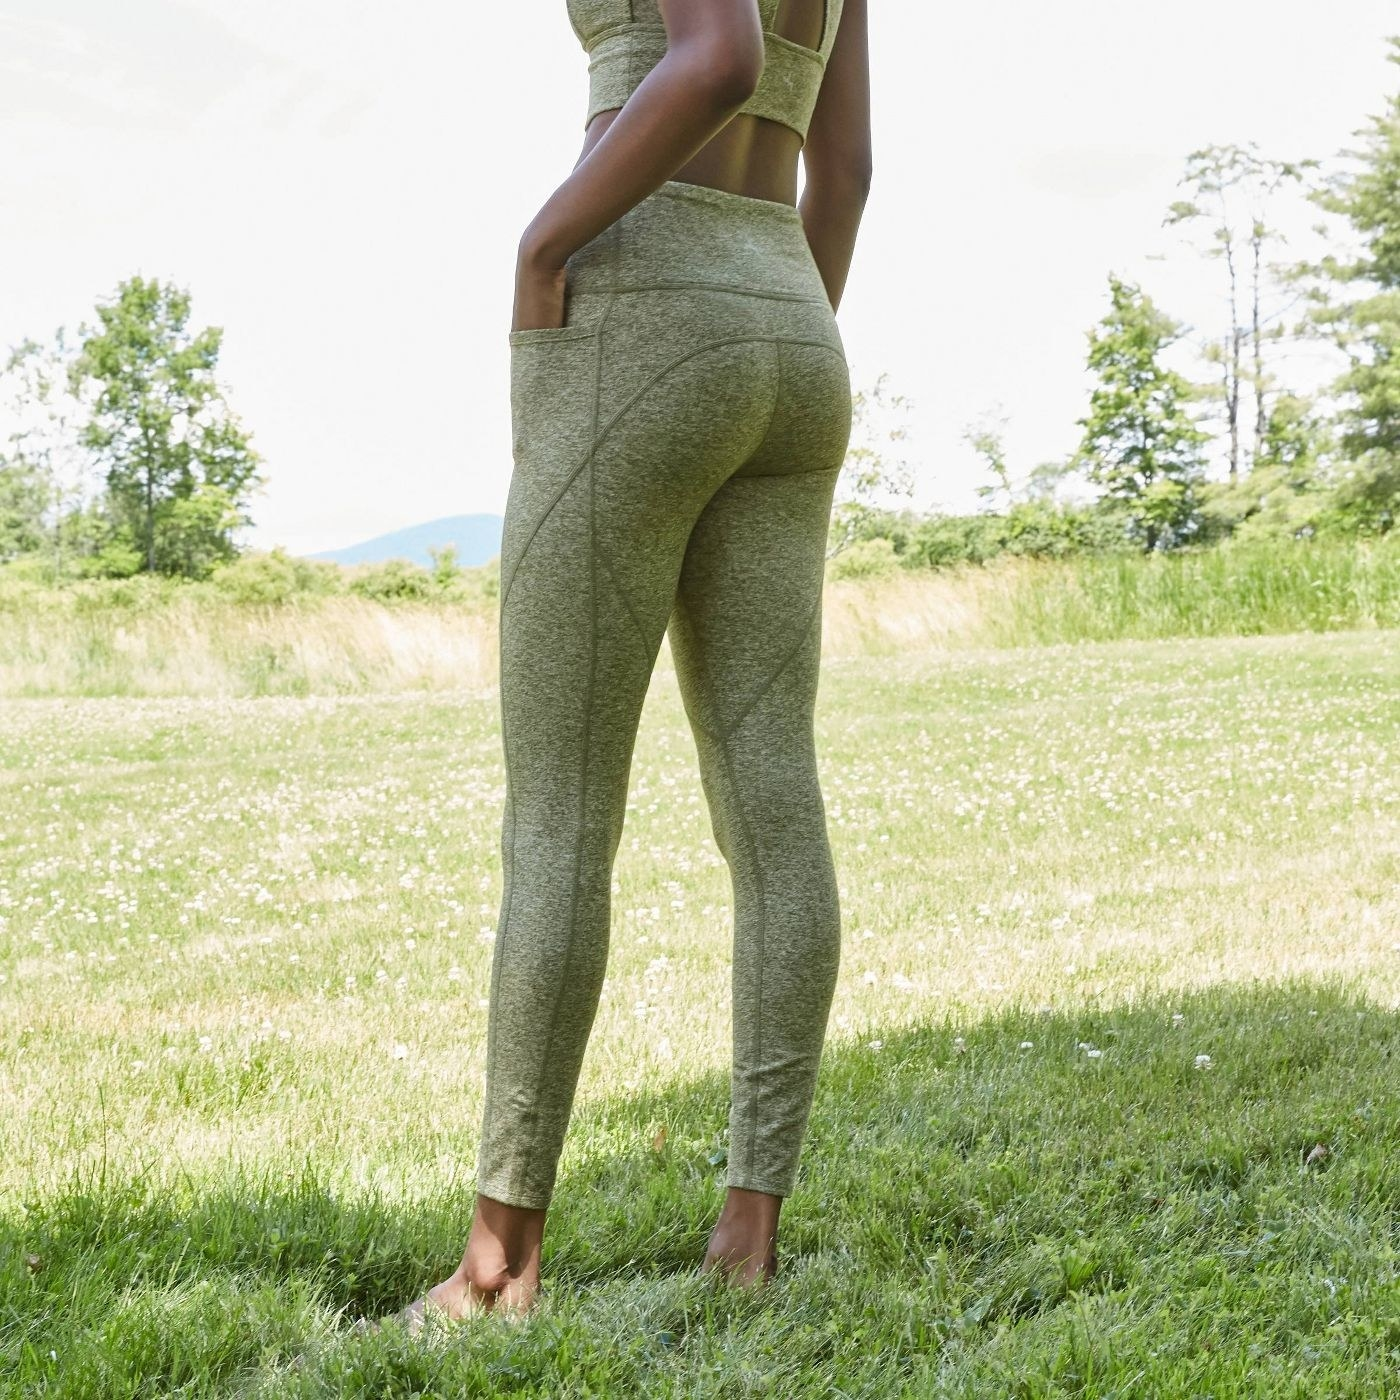 Model wearing the heather green leggings